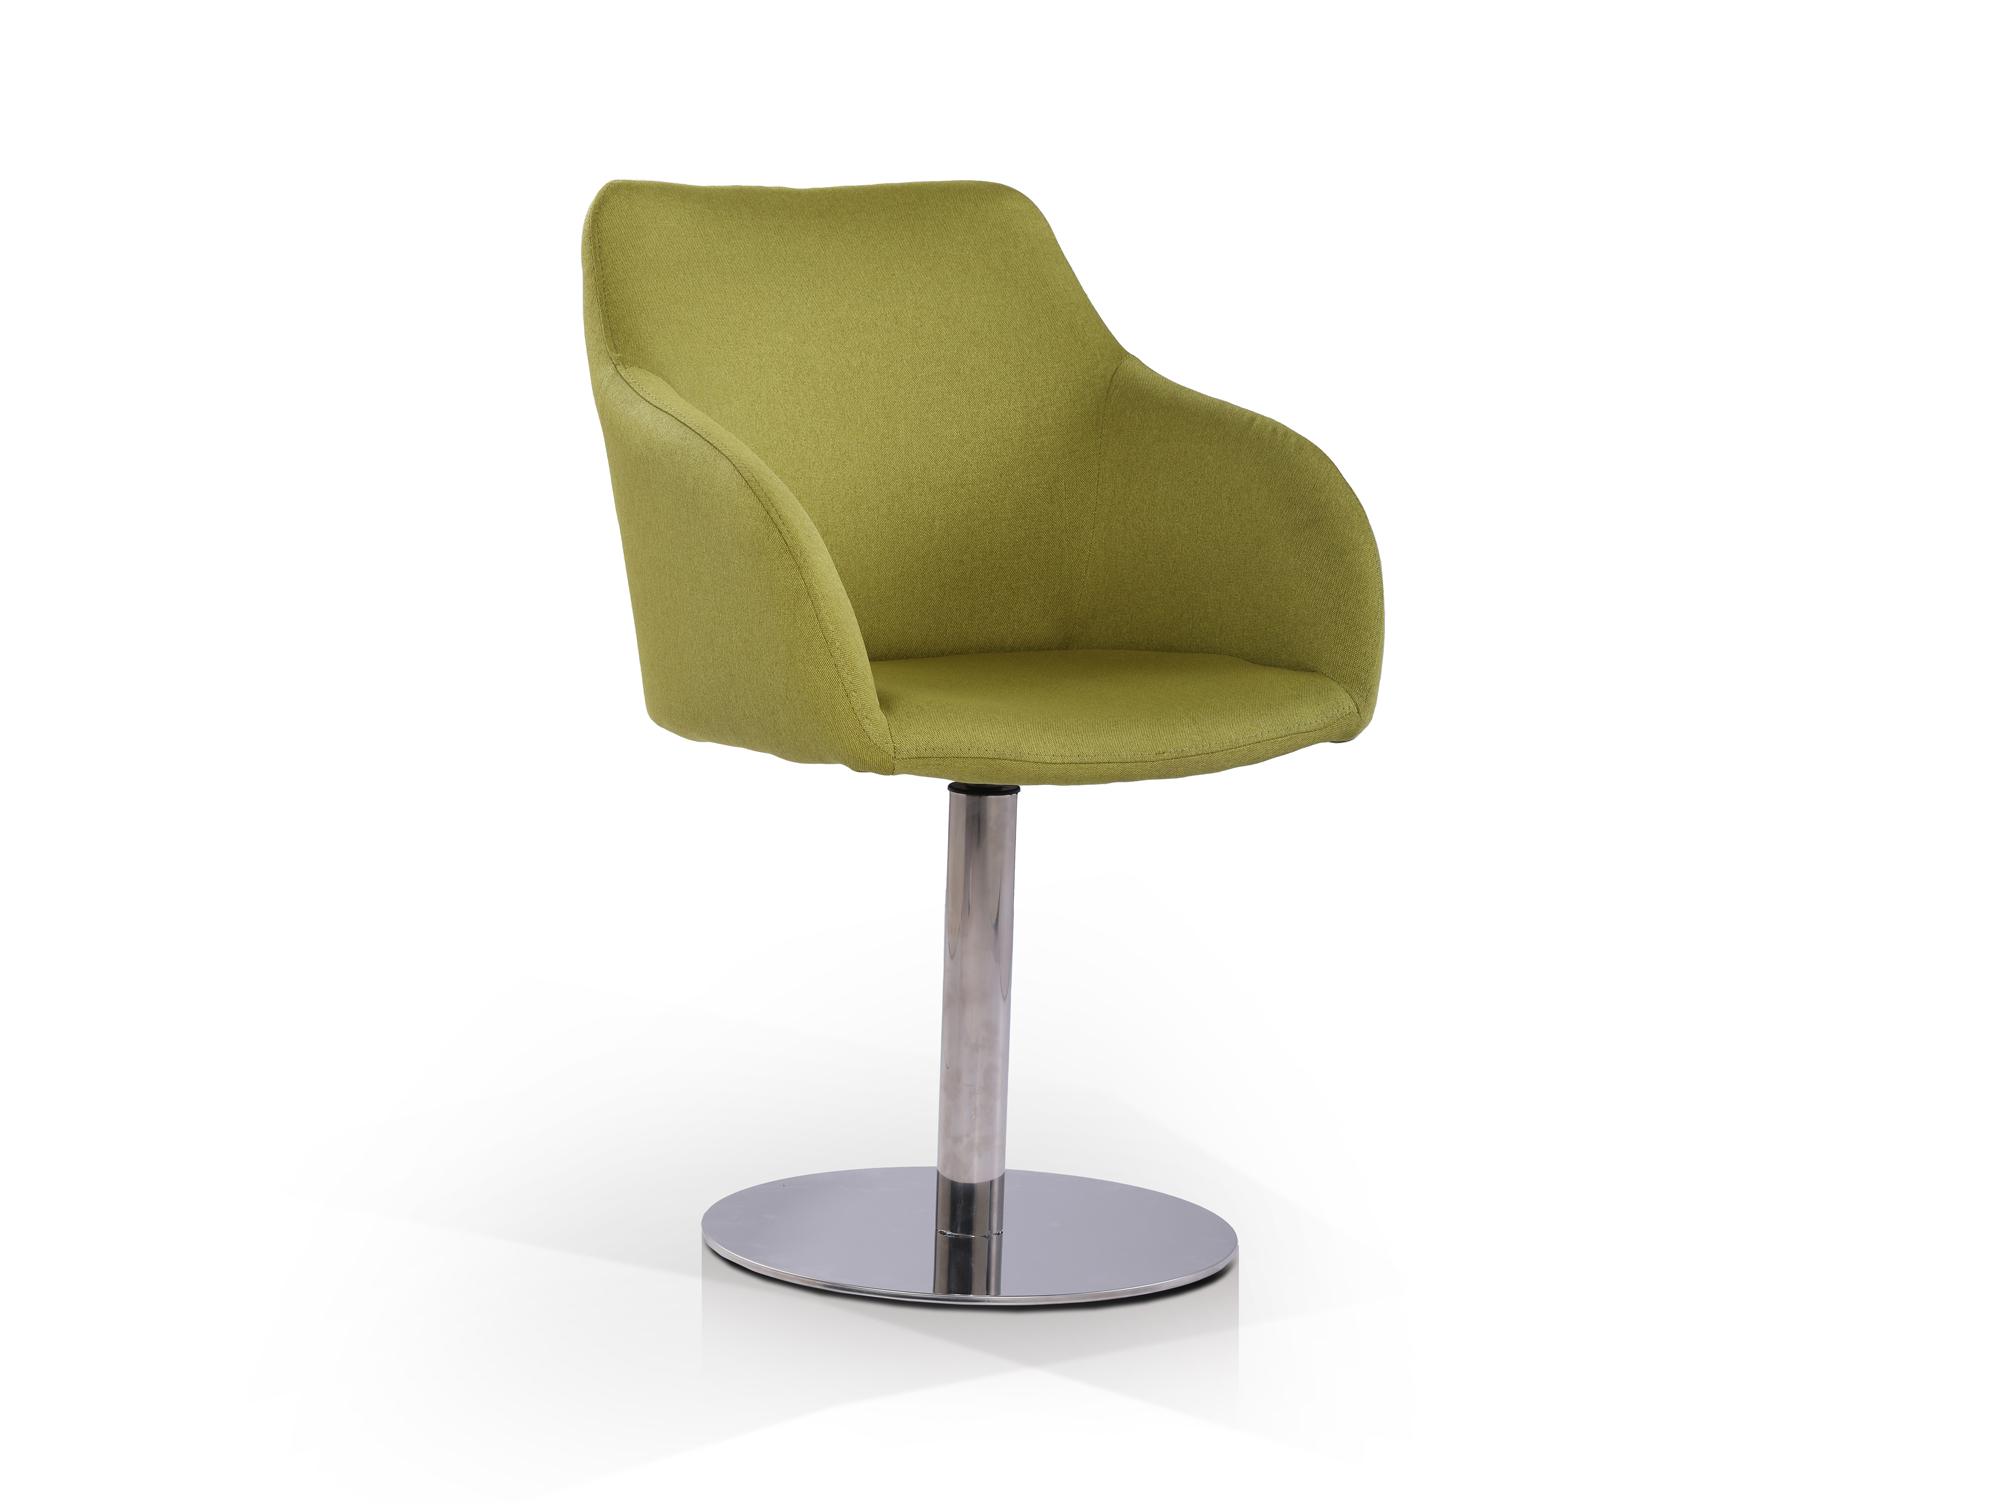 tobe schalendrehstuhl esszimmerstuhl mit stoffbezug gr n. Black Bedroom Furniture Sets. Home Design Ideas